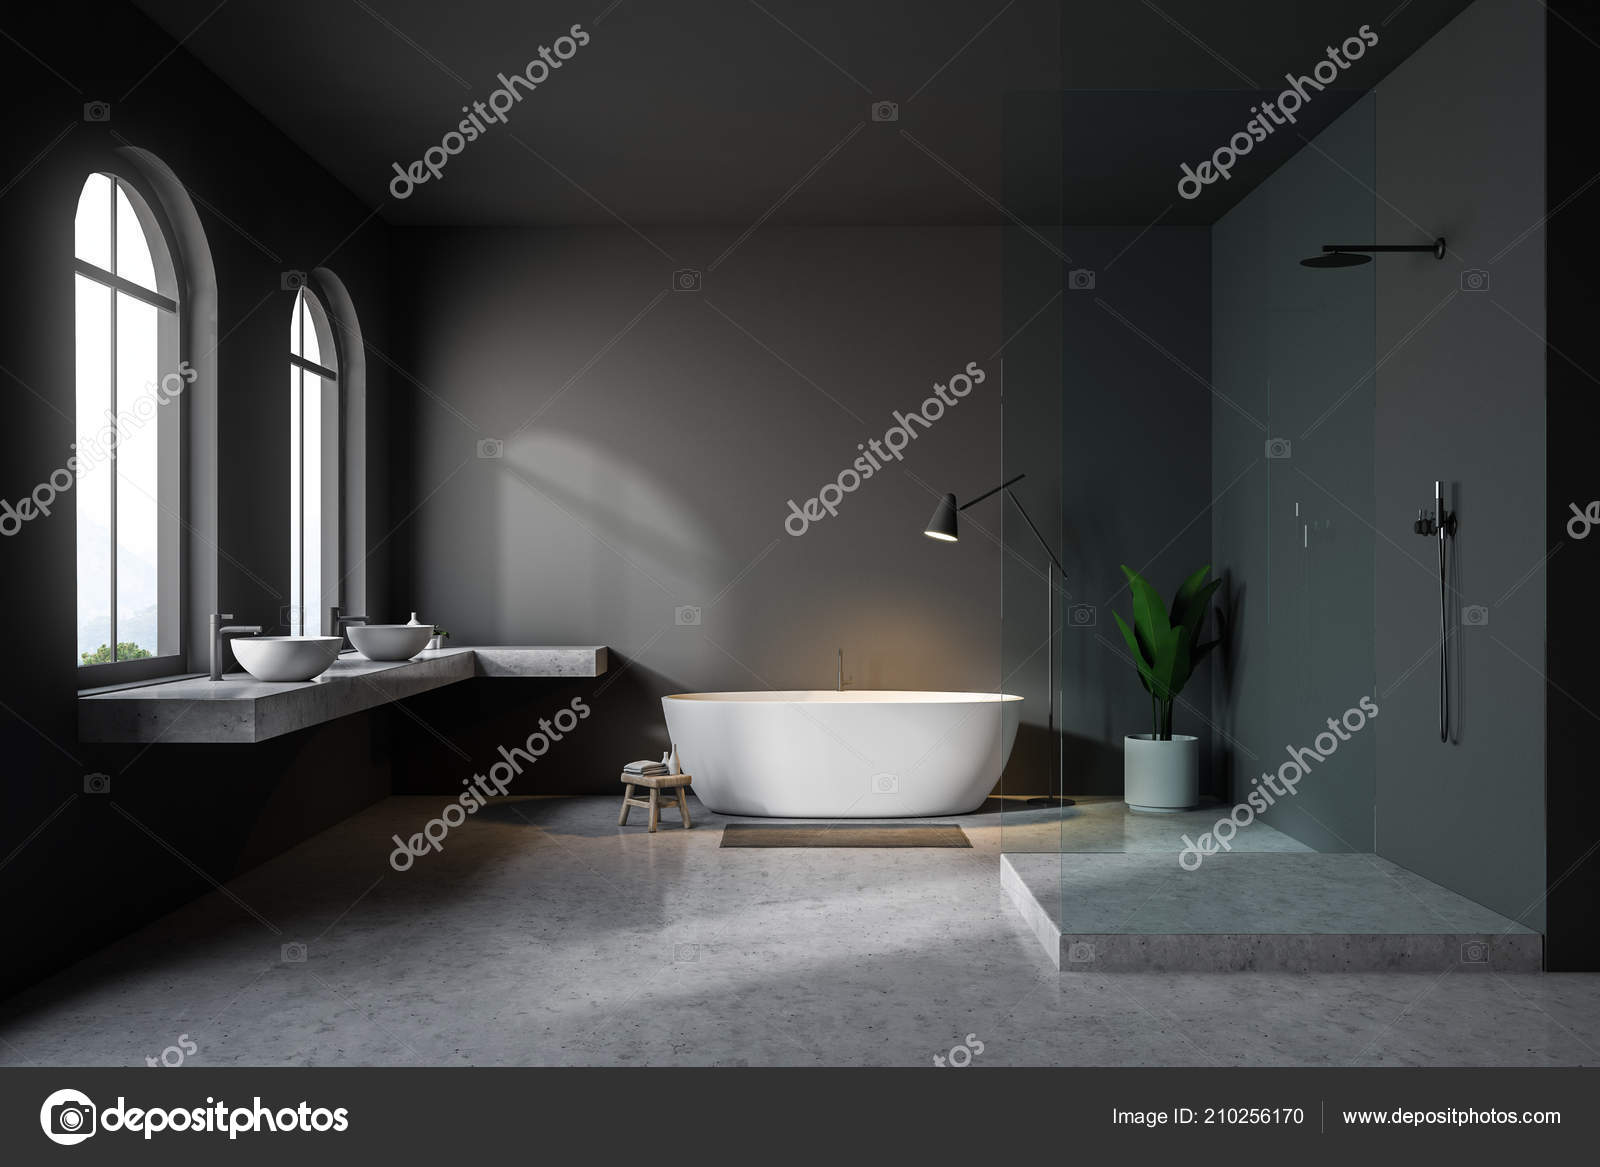 Modern Gray Wall Bathroom Interior Concrete Floor Arched